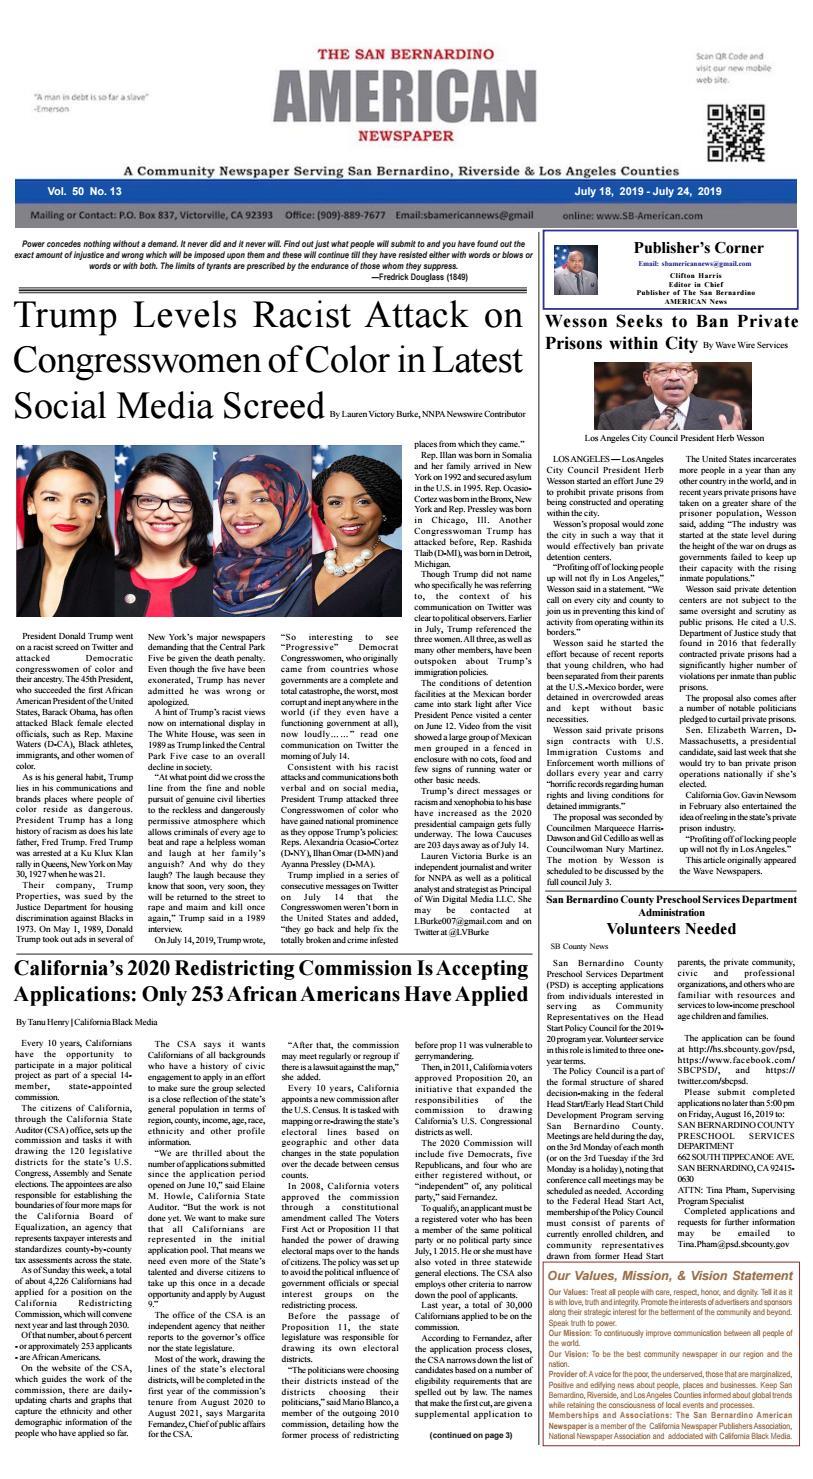 Sb American Week Ending 724 By San Bernardino American News throughout Reese A Calendar Year Taxpayer